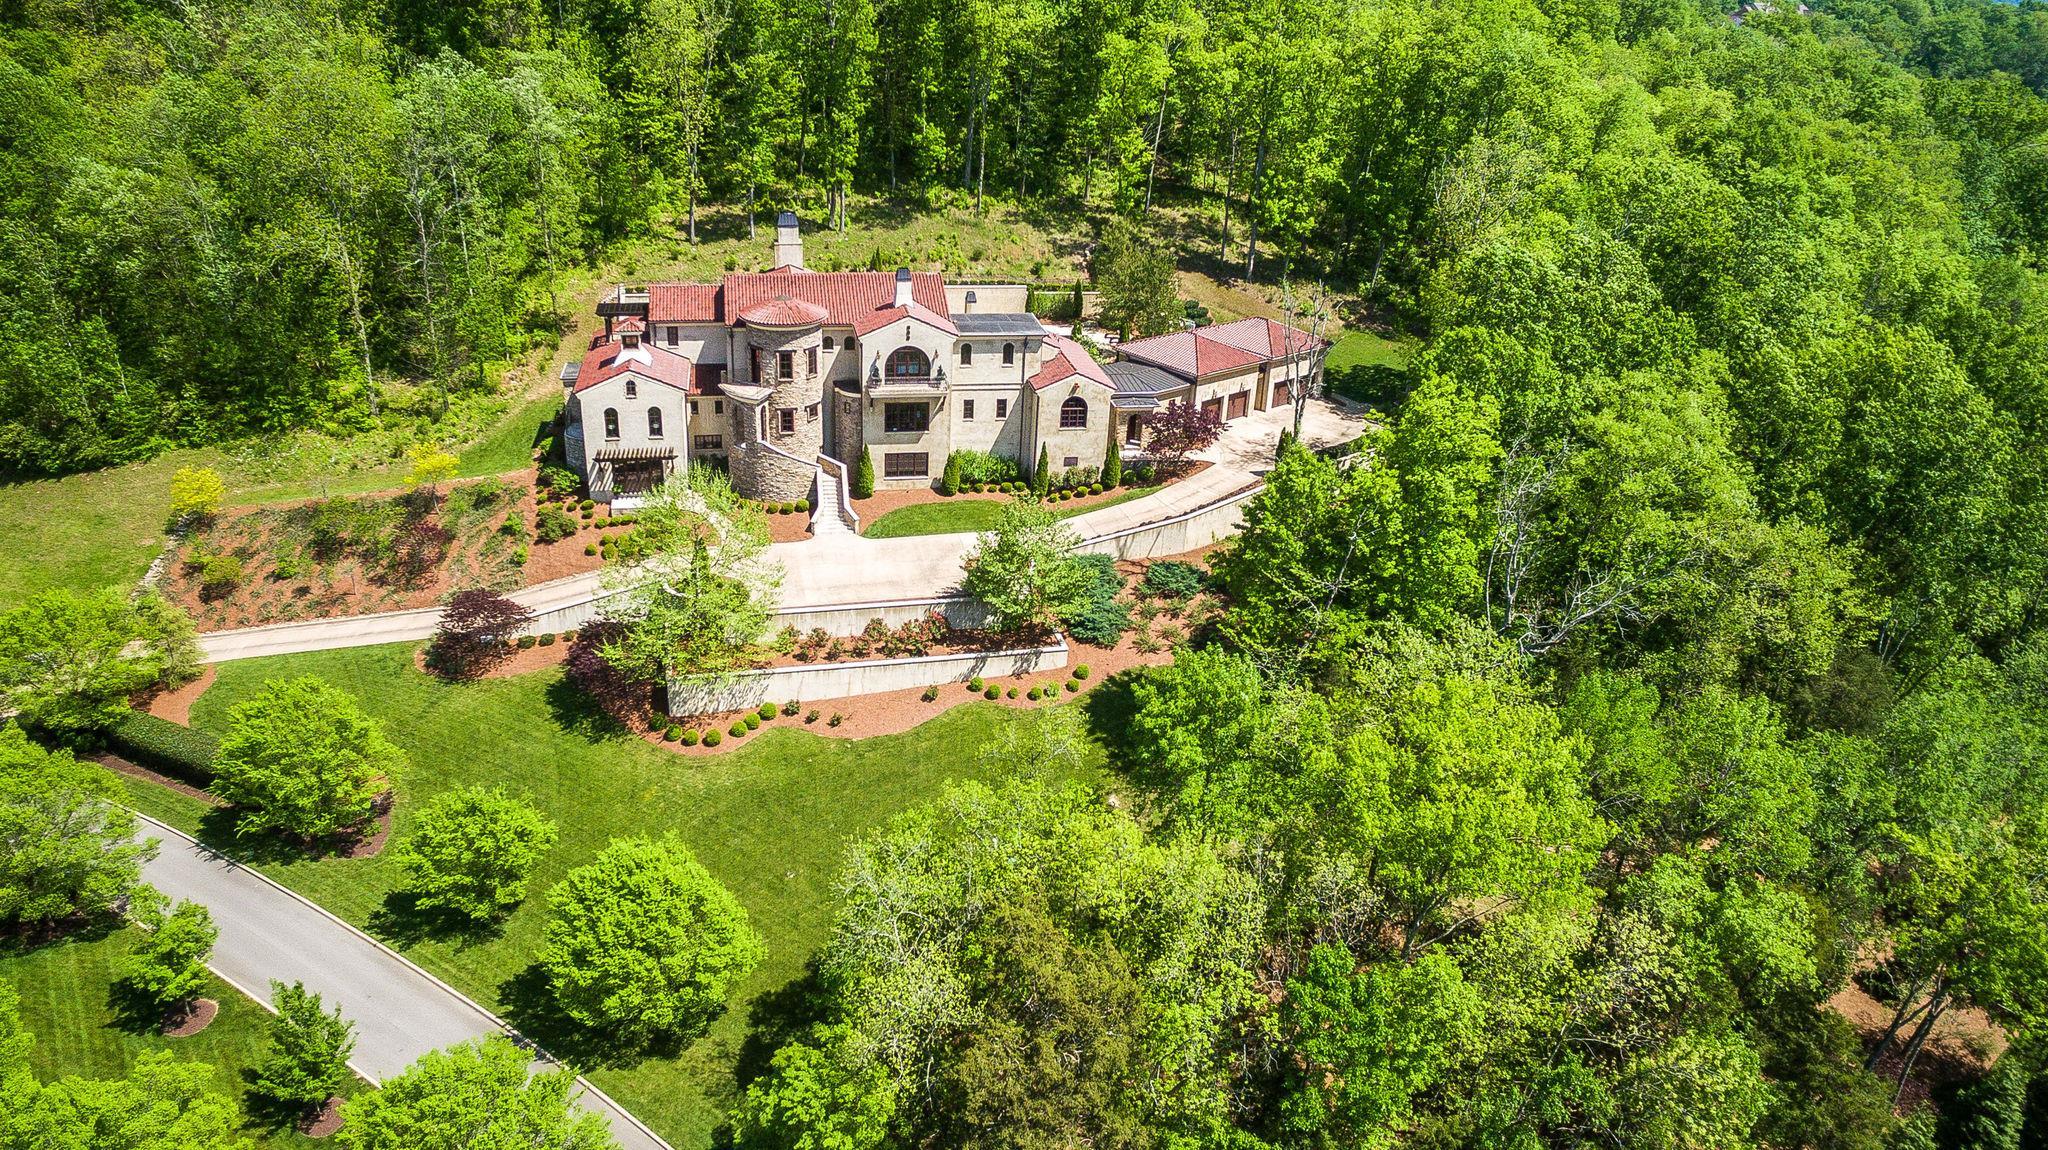 1613 Whispering Hills Dr, Franklin, TN 37069 - Franklin, TN real estate listing